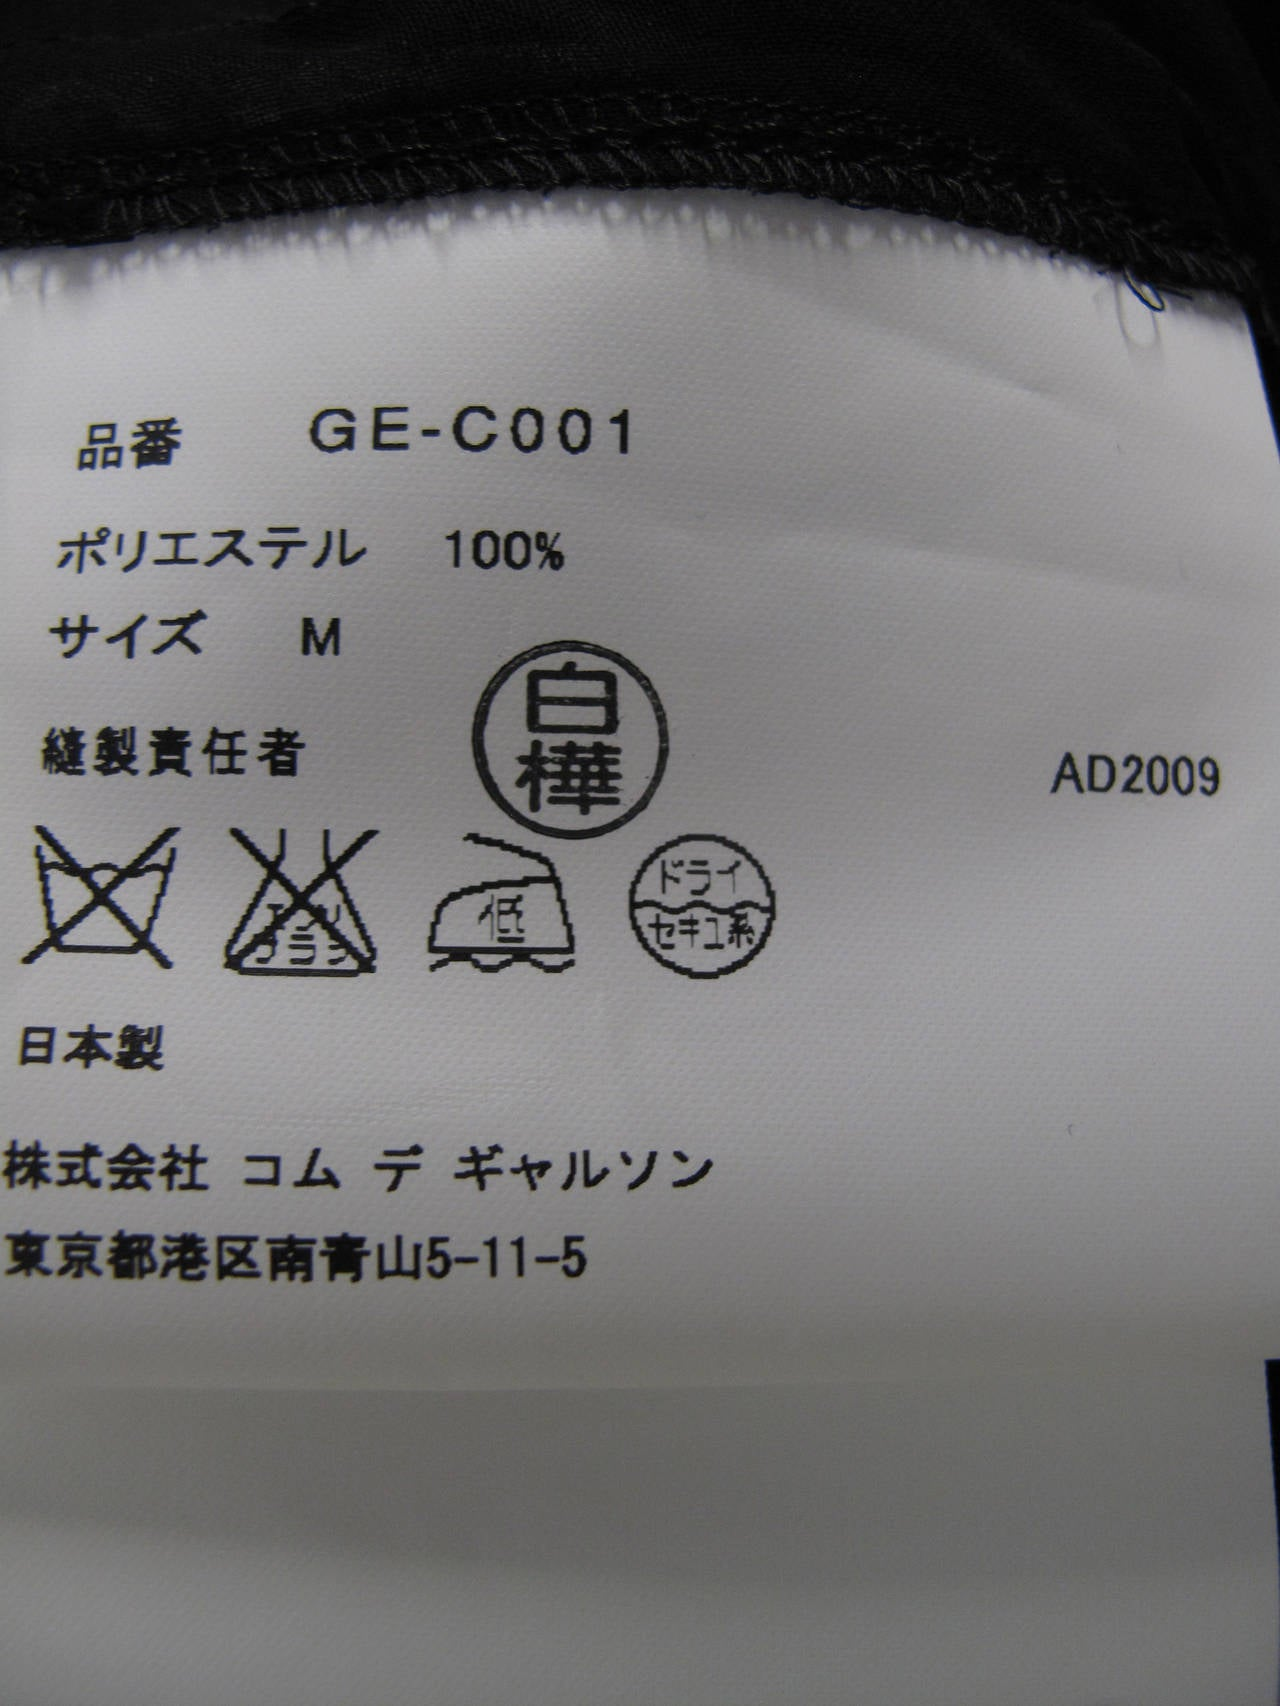 2009 Comme des Garcons Sheer Trench Coat 7